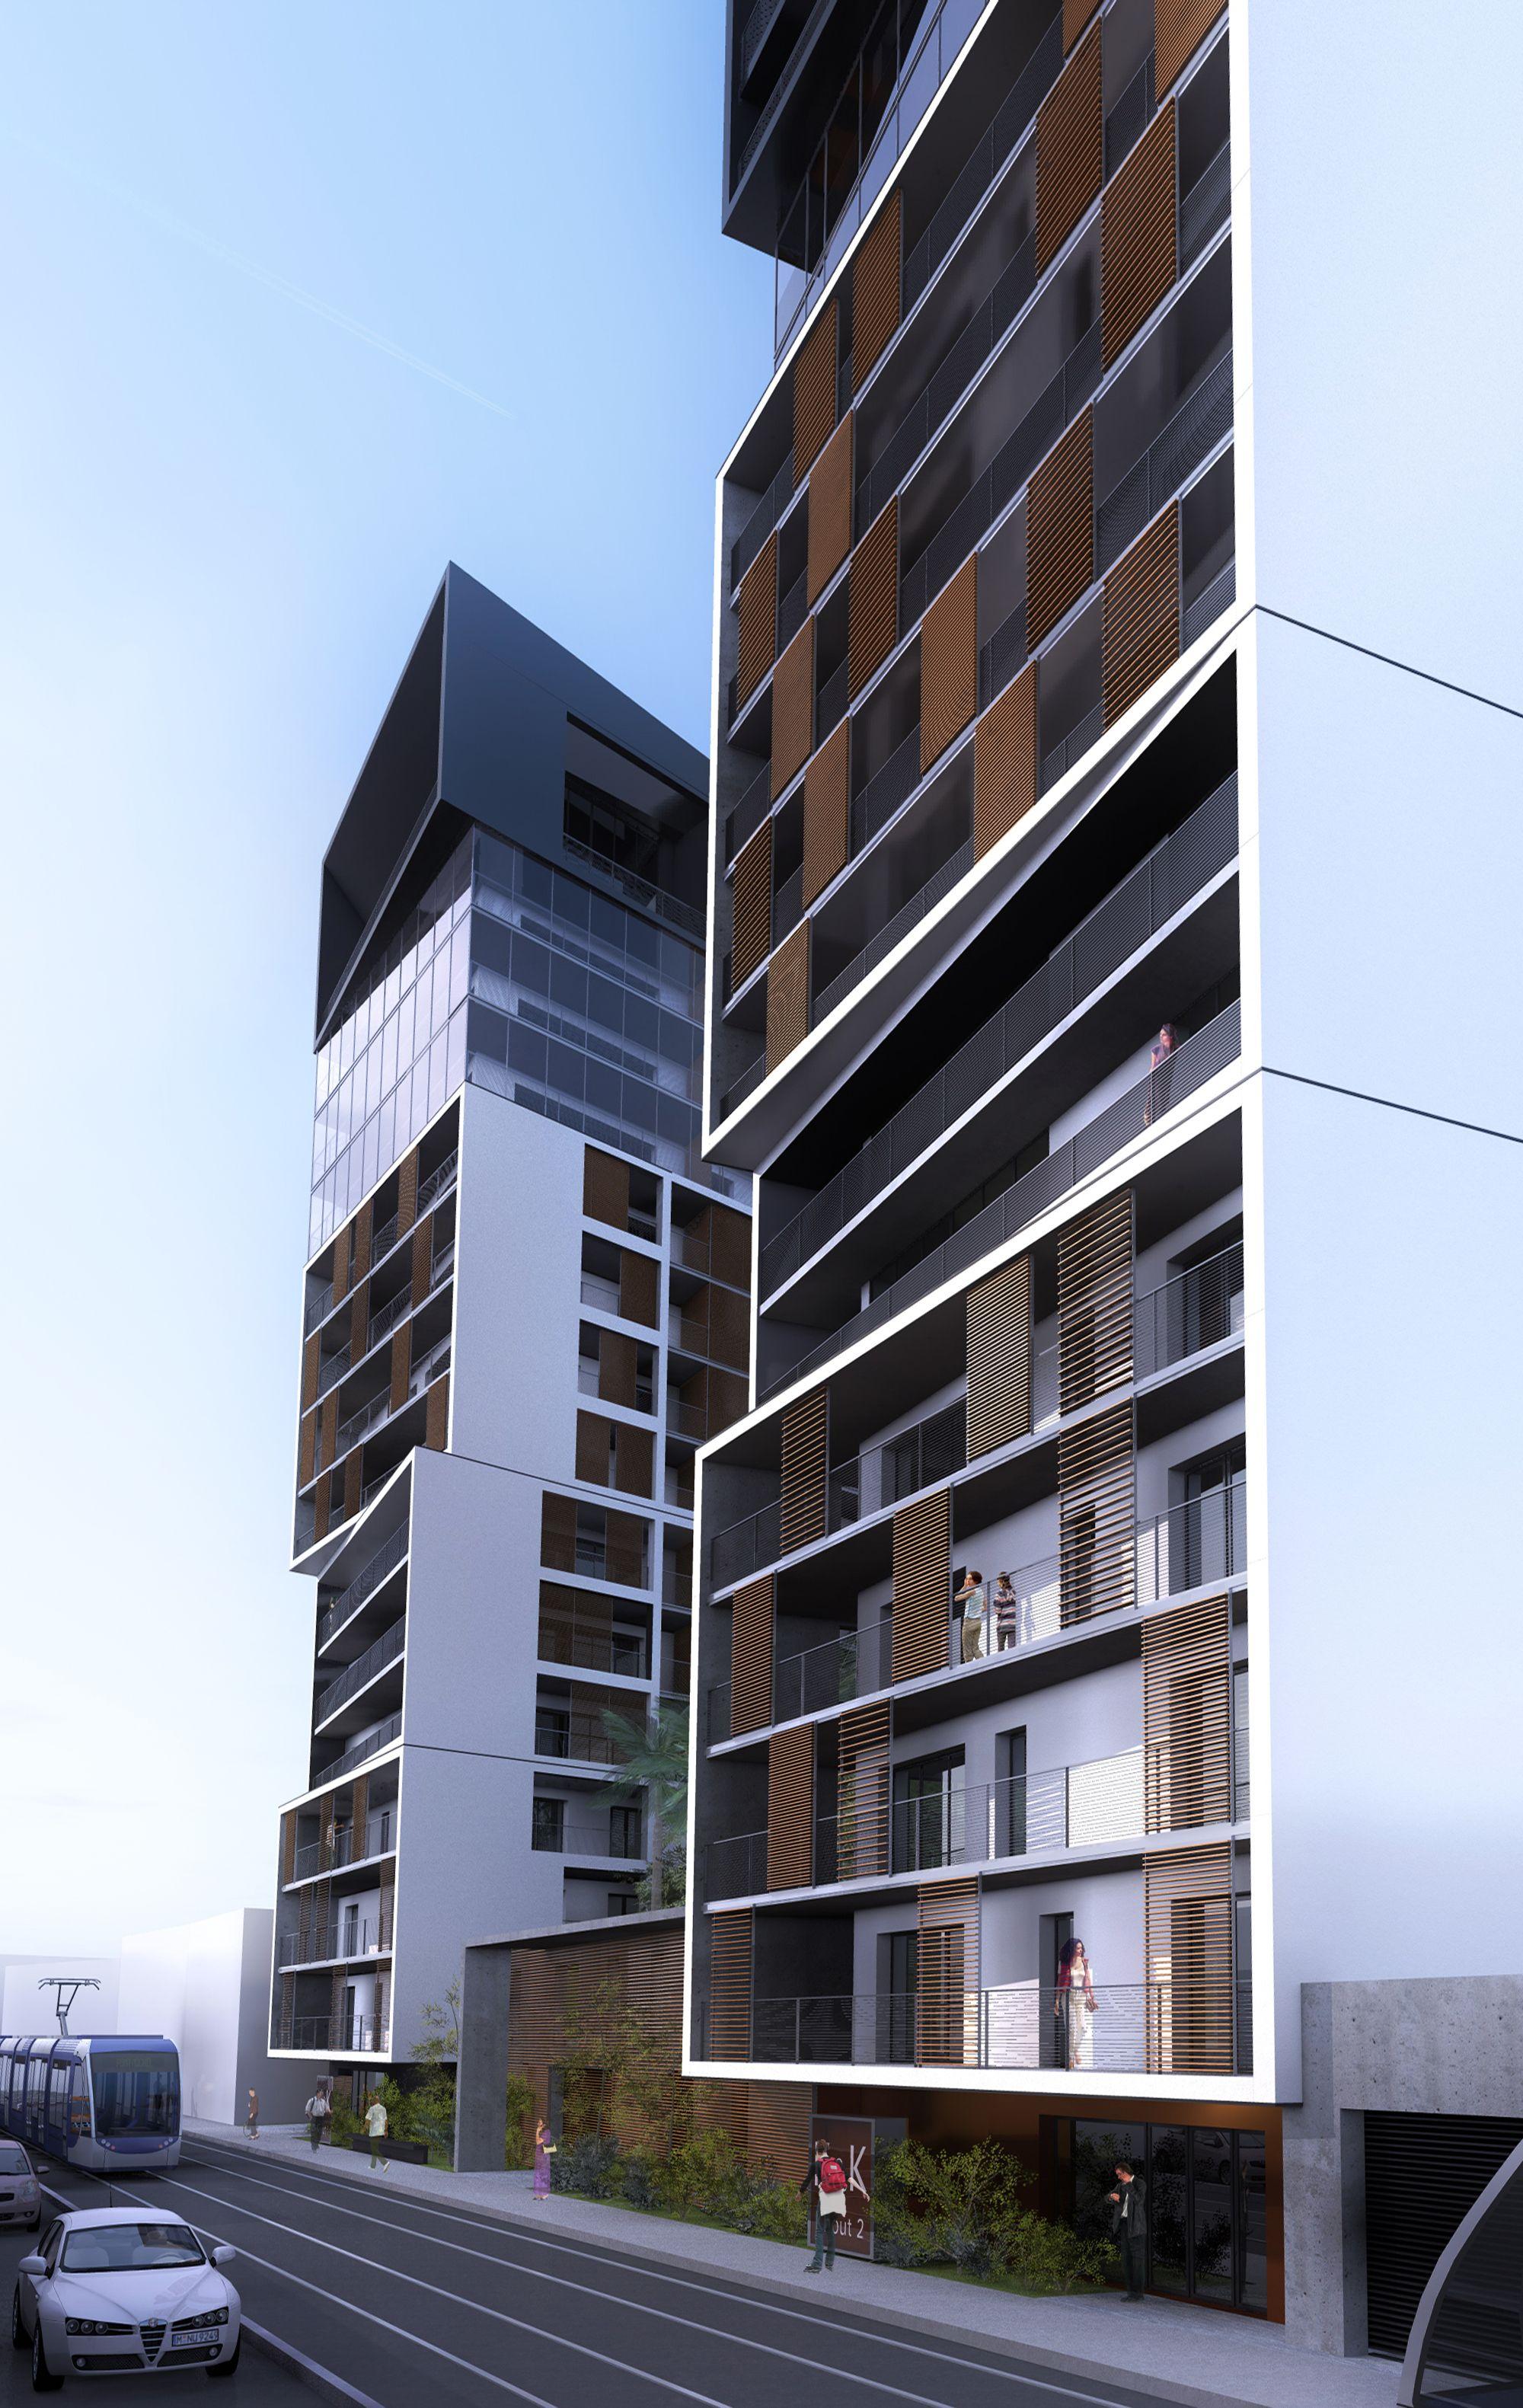 hk tours oran by agc architectes facade pinterest. Black Bedroom Furniture Sets. Home Design Ideas